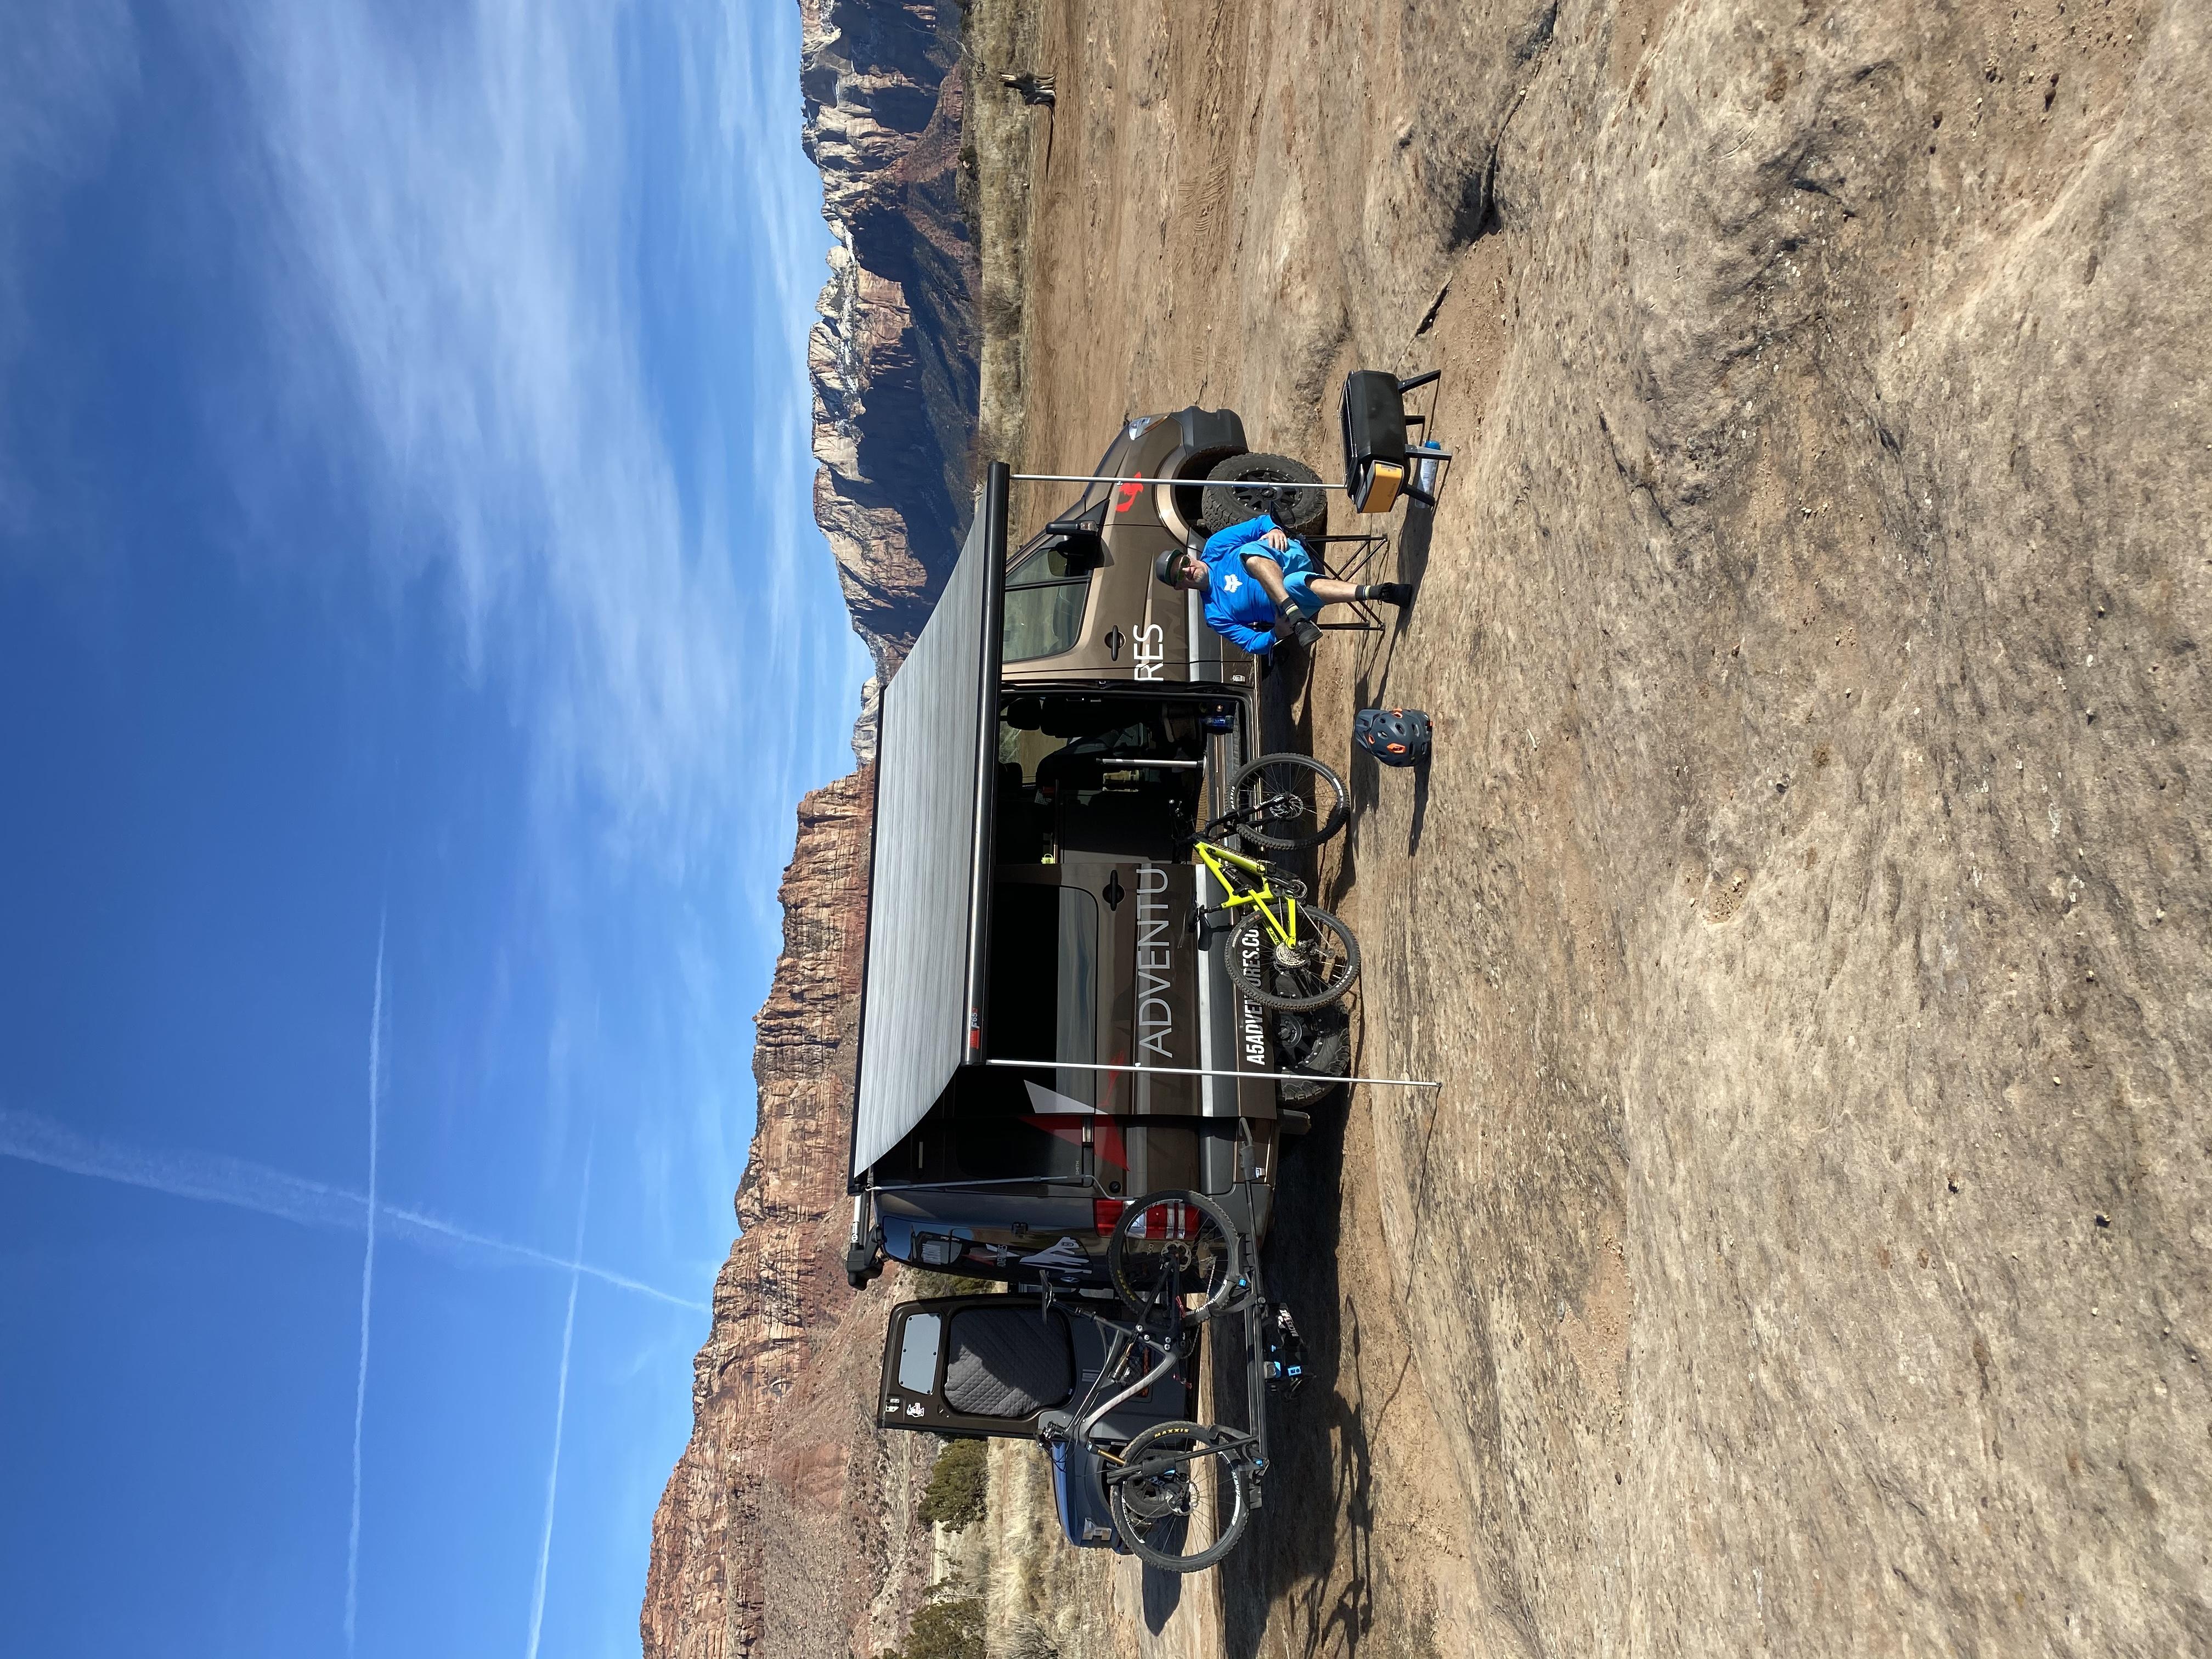 Mountain bike overnighter trip. Mercedes-Benz Sprinter 2017